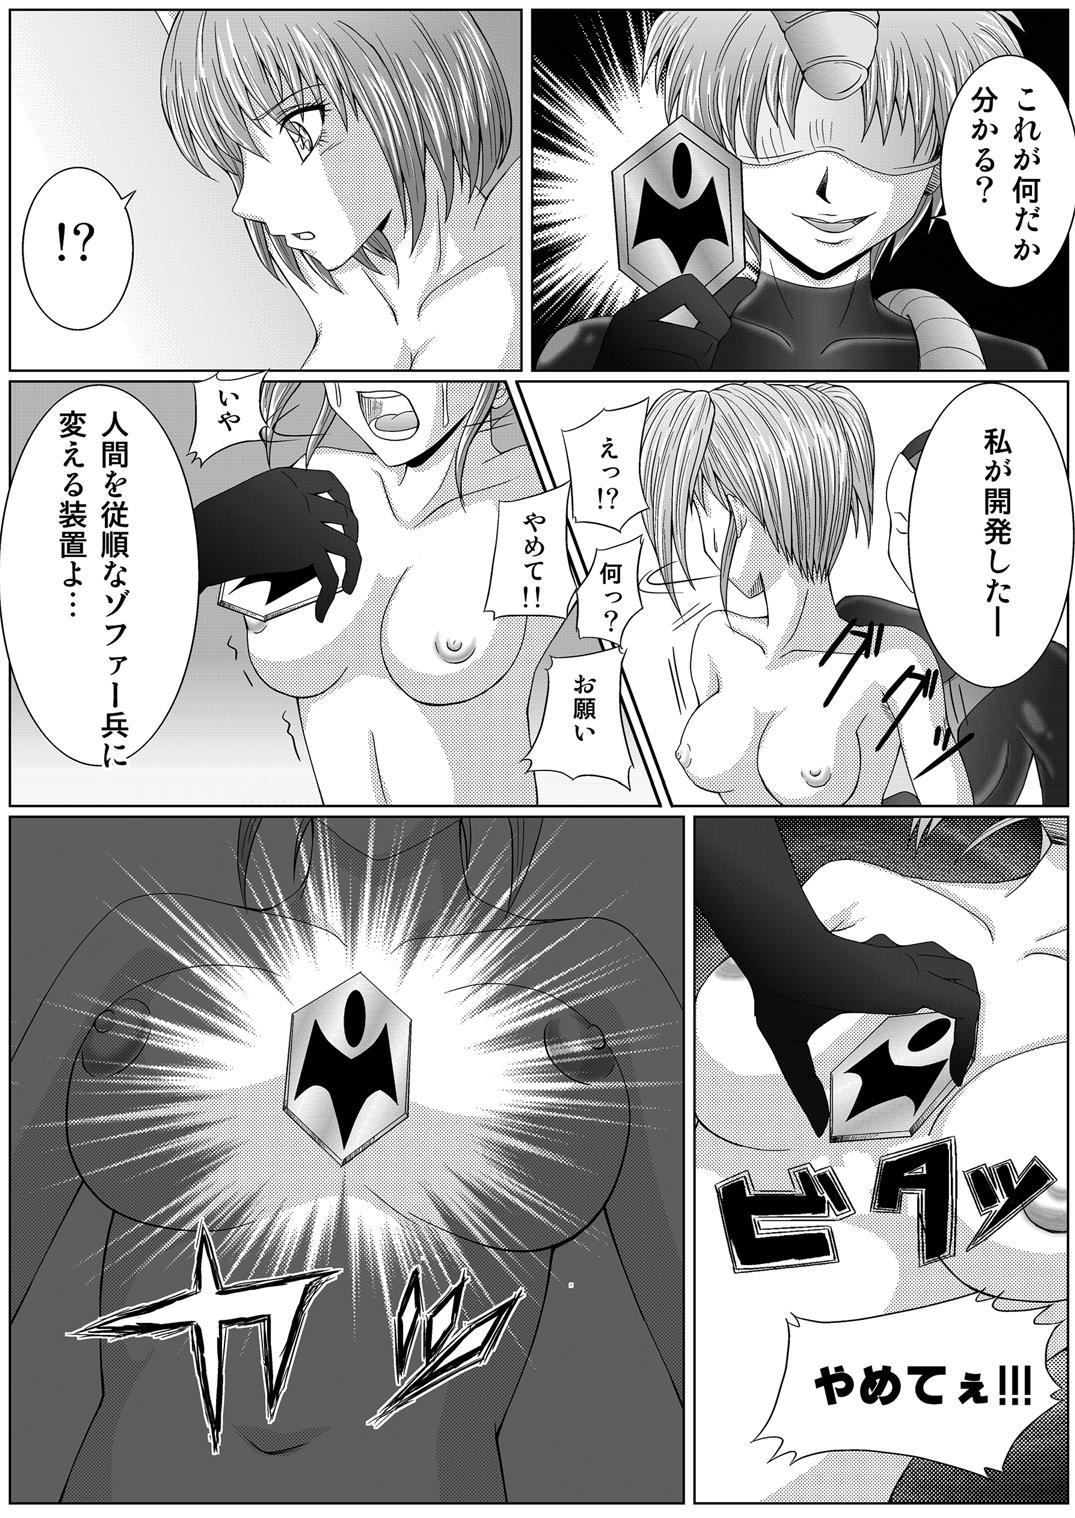 [Macxe's (monmon)] Tokubousentai Dinaranger ~Heroine Kairaku Sennou Keikaku~ Vol.01/02/03 (Renkaban) [Digital] 20